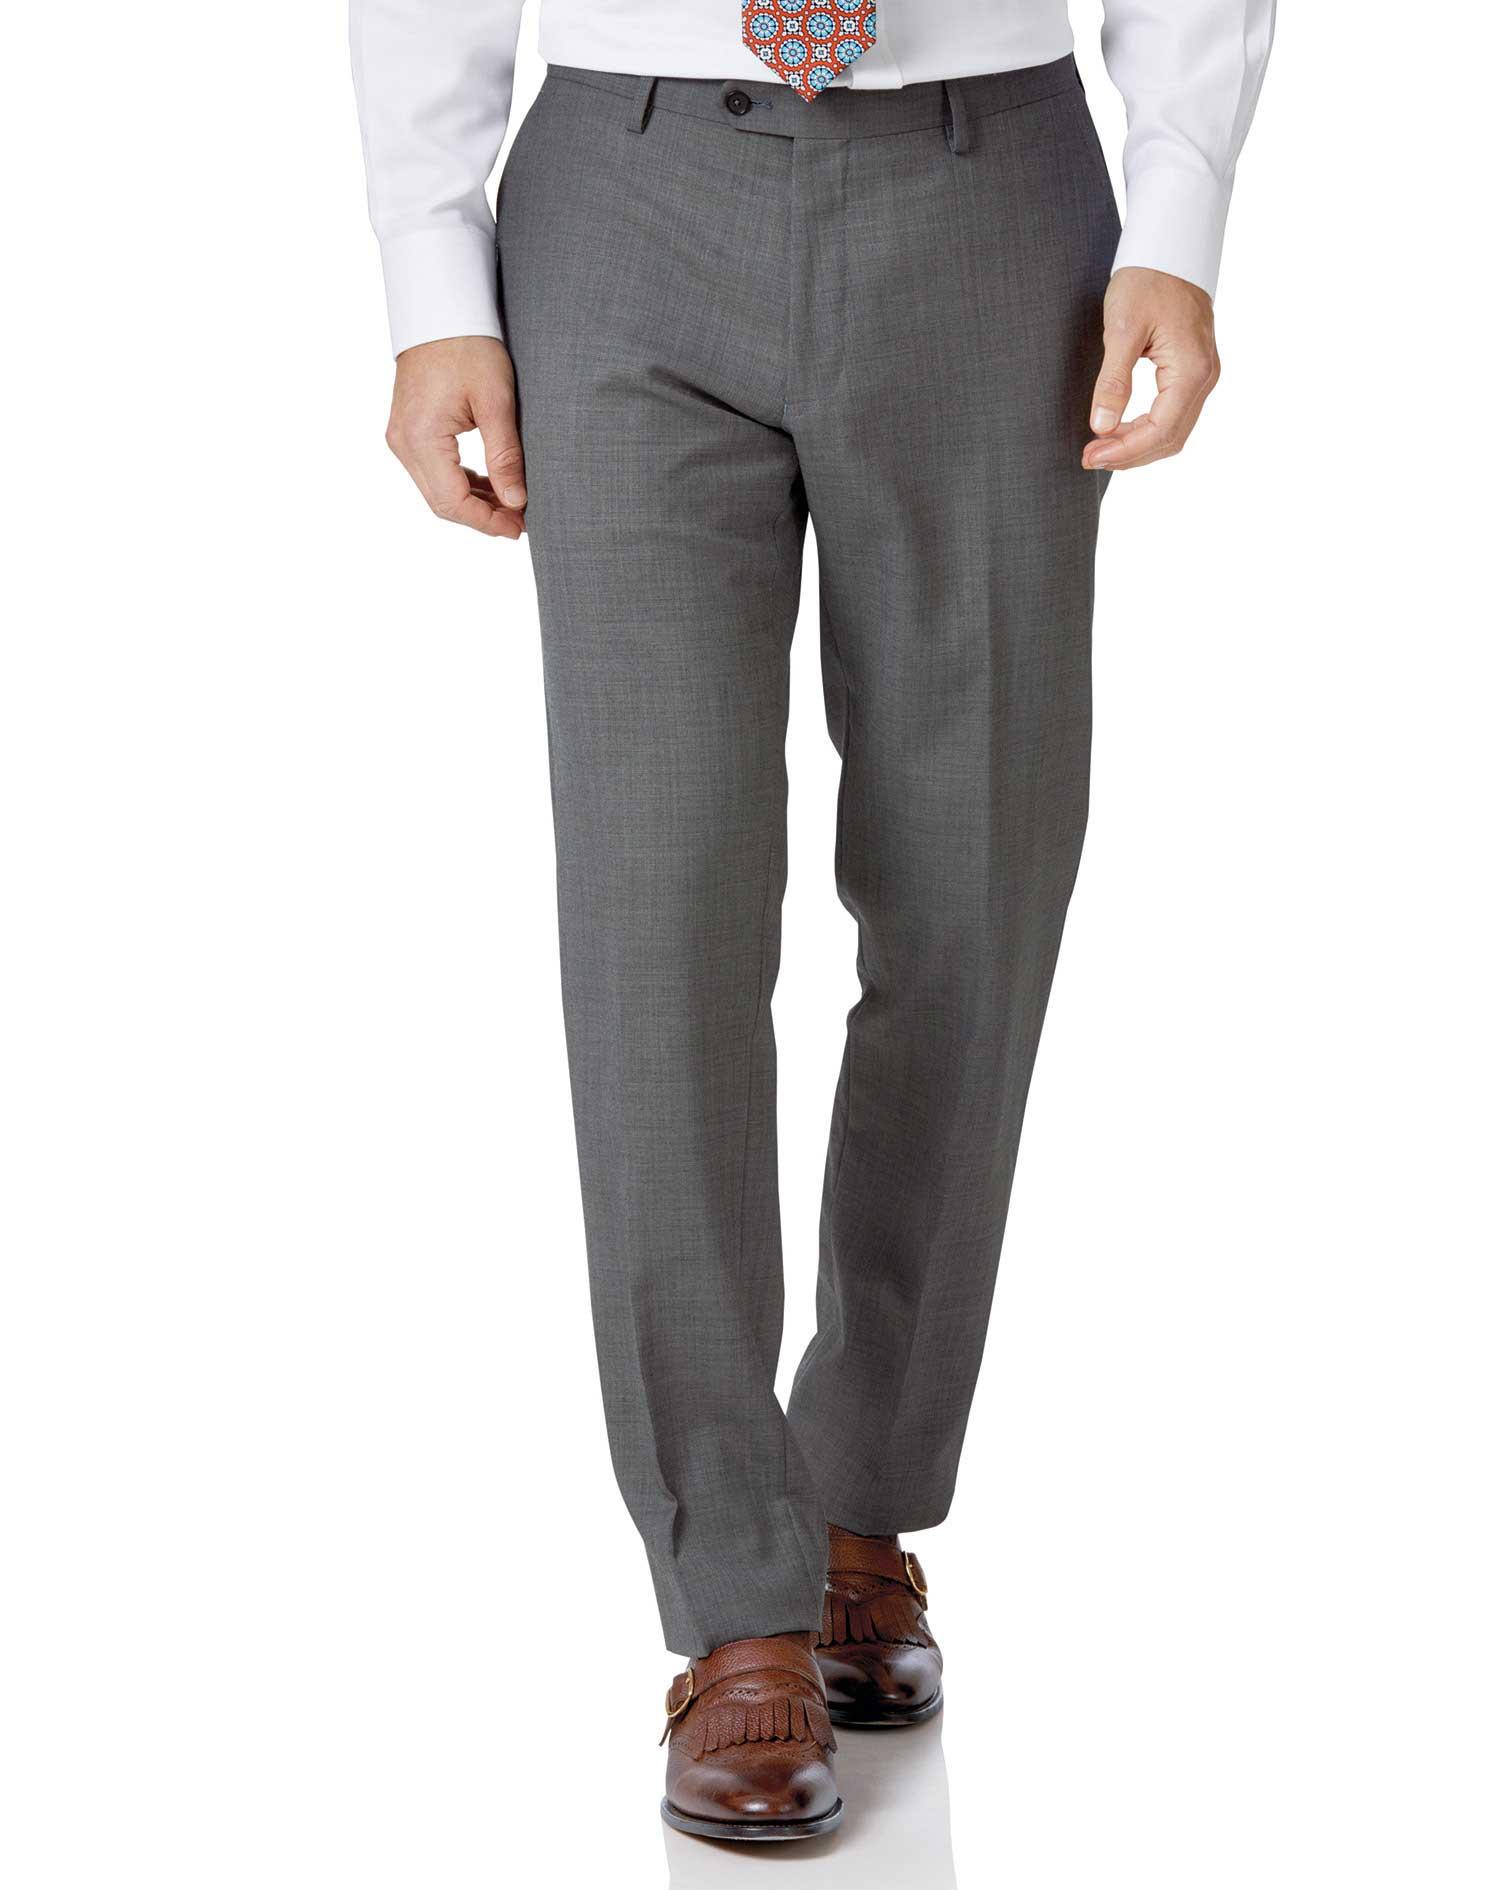 Light Grey Slim Fit Sharkskin Travel Suit Trousers Size W40 L38 by Charles Tyrwhitt